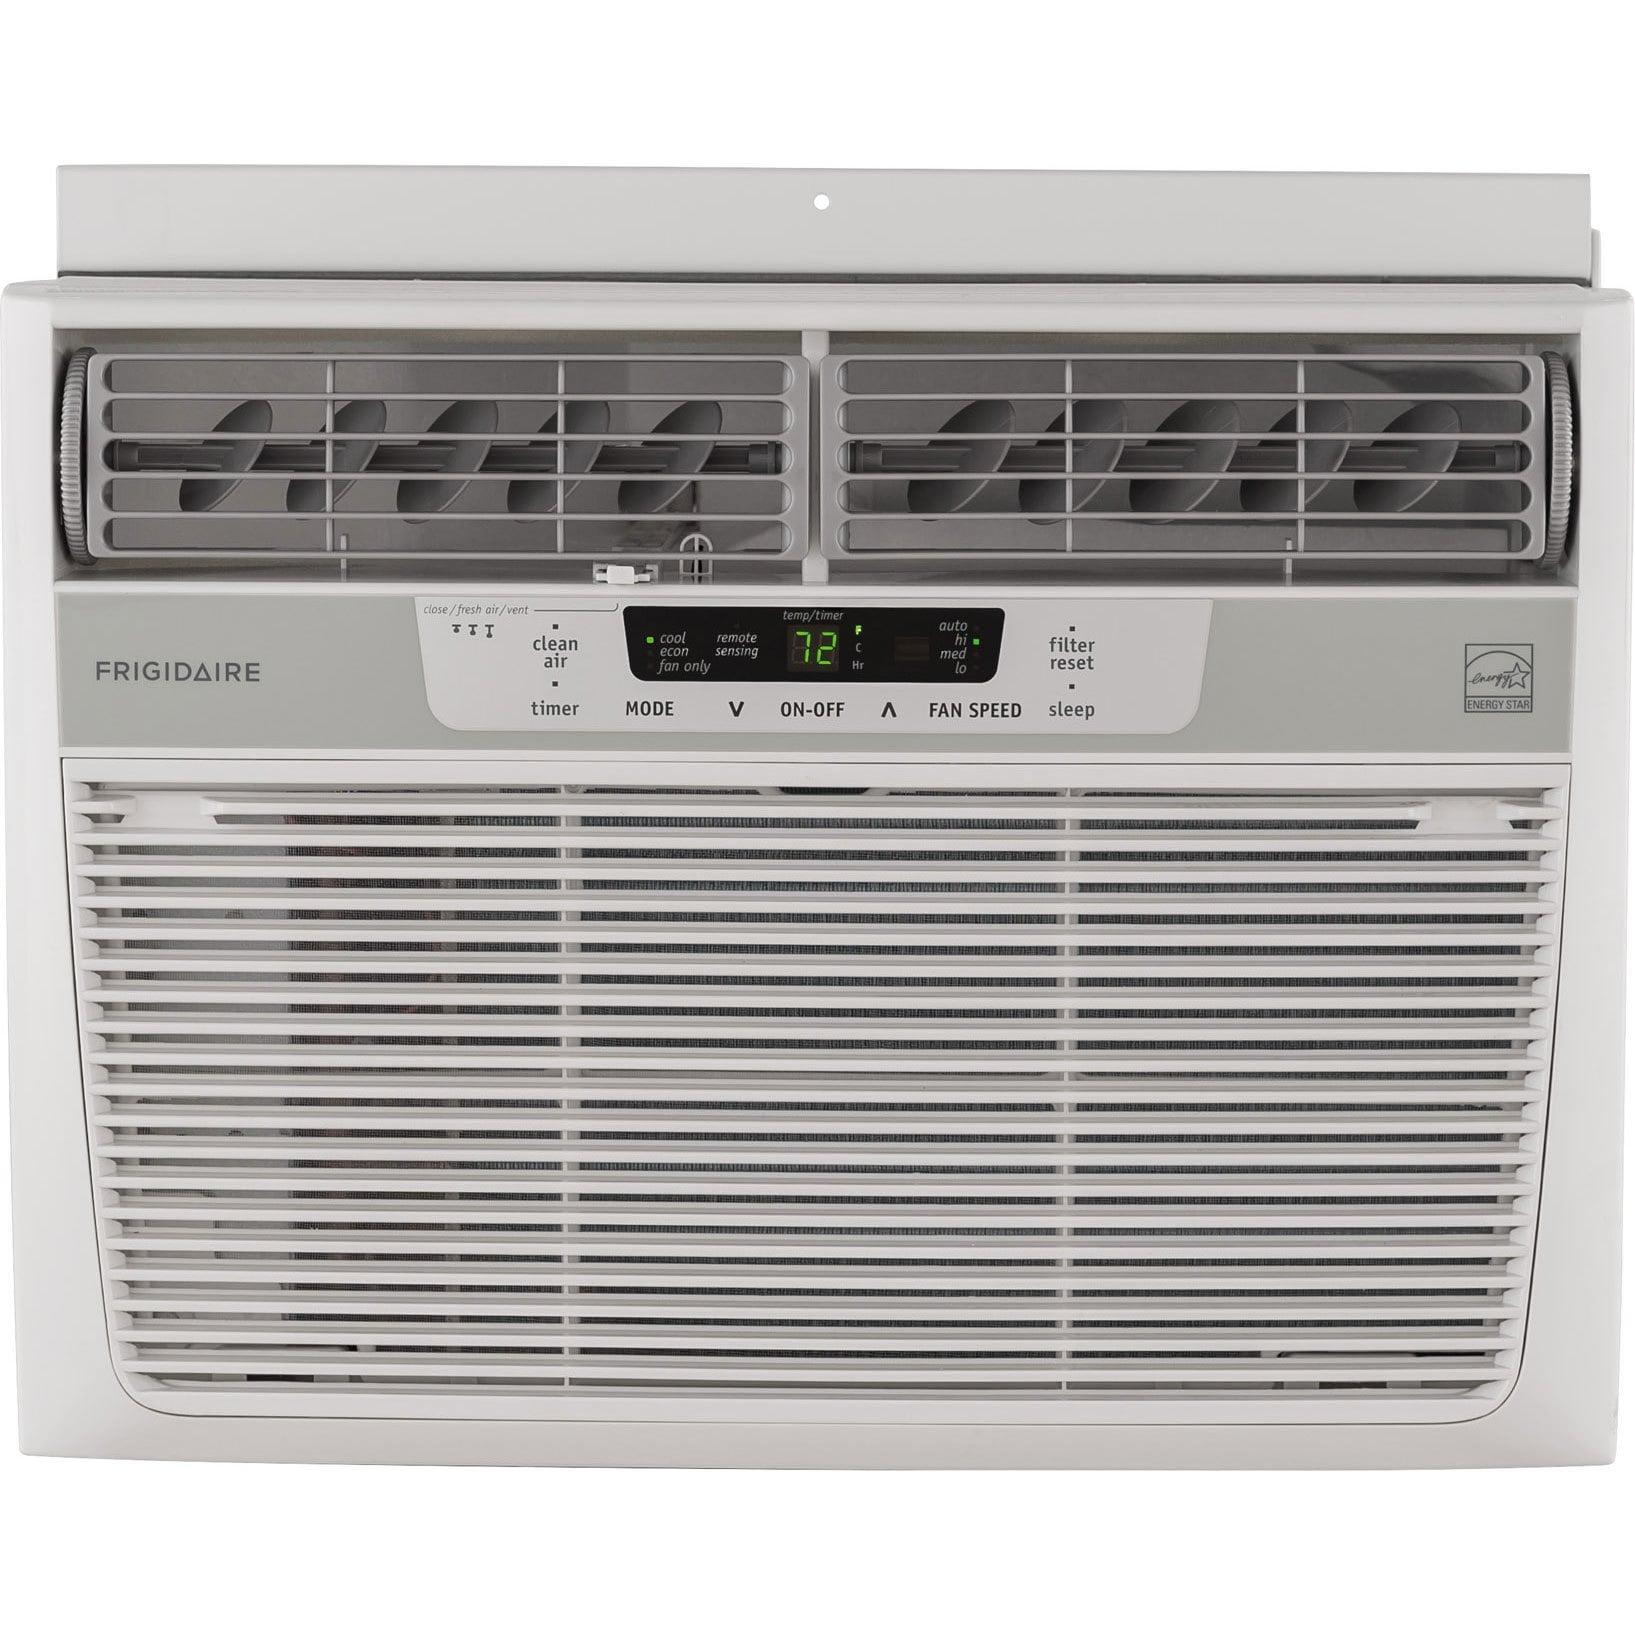 Frigidaire 12,000 BTU Window Air Conditioner - White Frigidaire 12,000 BTU Window Air Conditioner